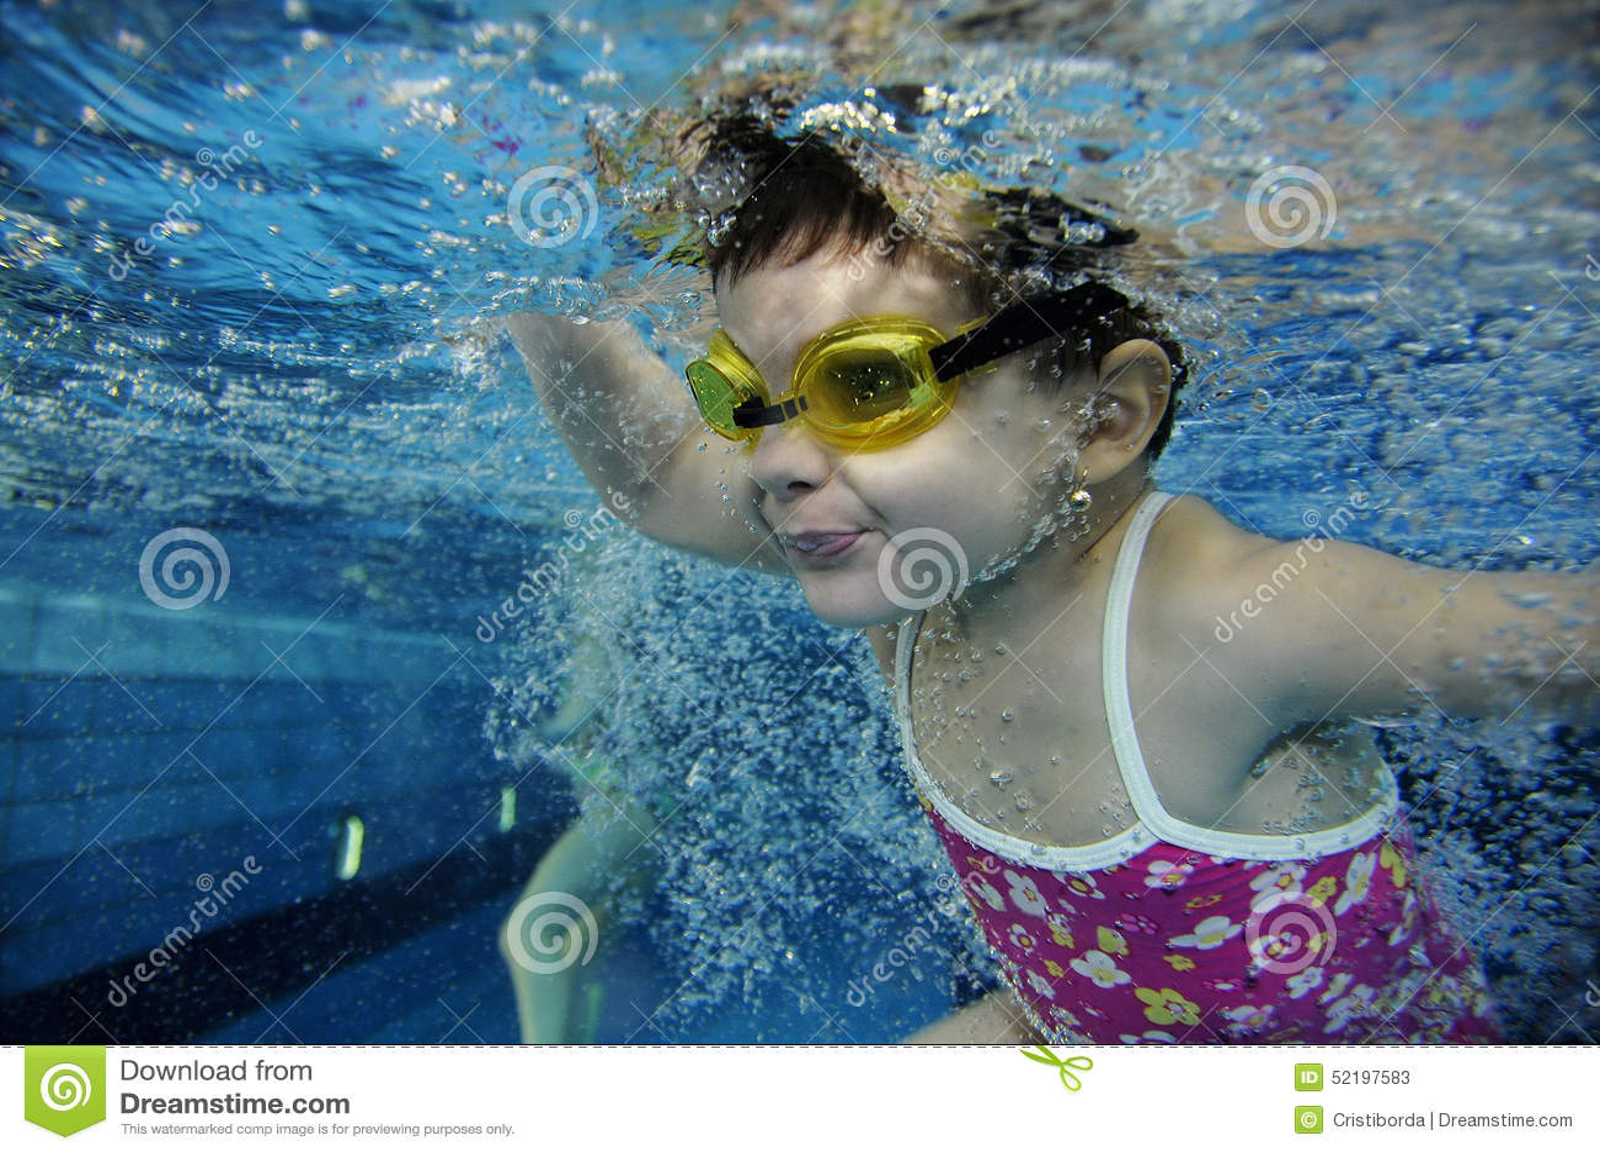 Lots of underwater sea creatures stock image for Burbuja piscina